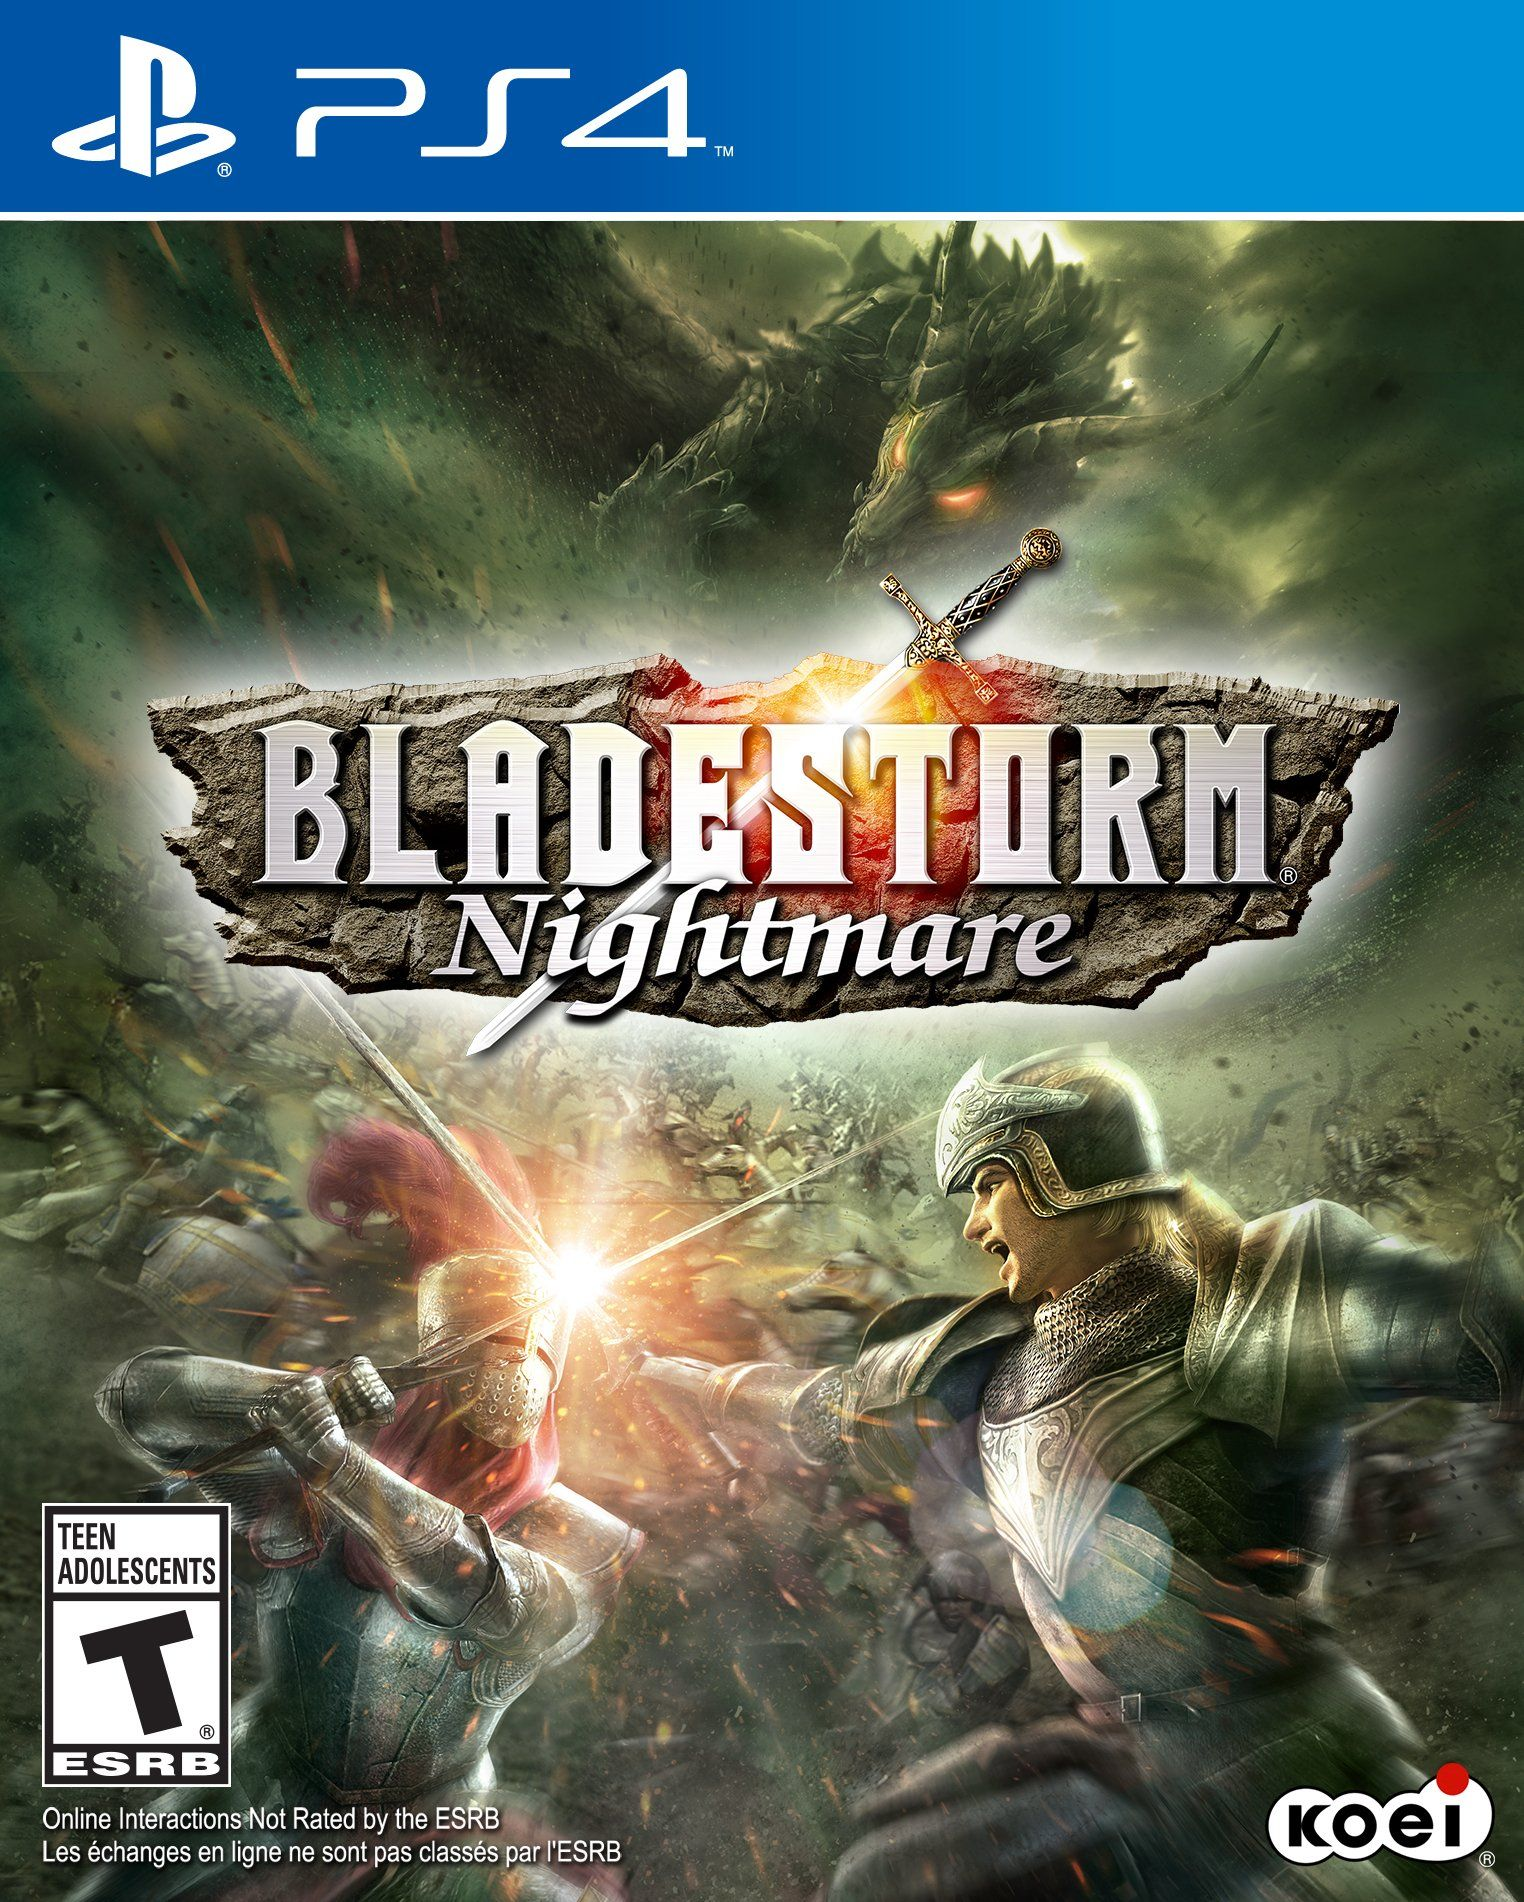 Bladestorm Nightmare Playstation 4 Bladestorm Nightmare Playstation Xbox One Games Video Games Xbox Xbox One